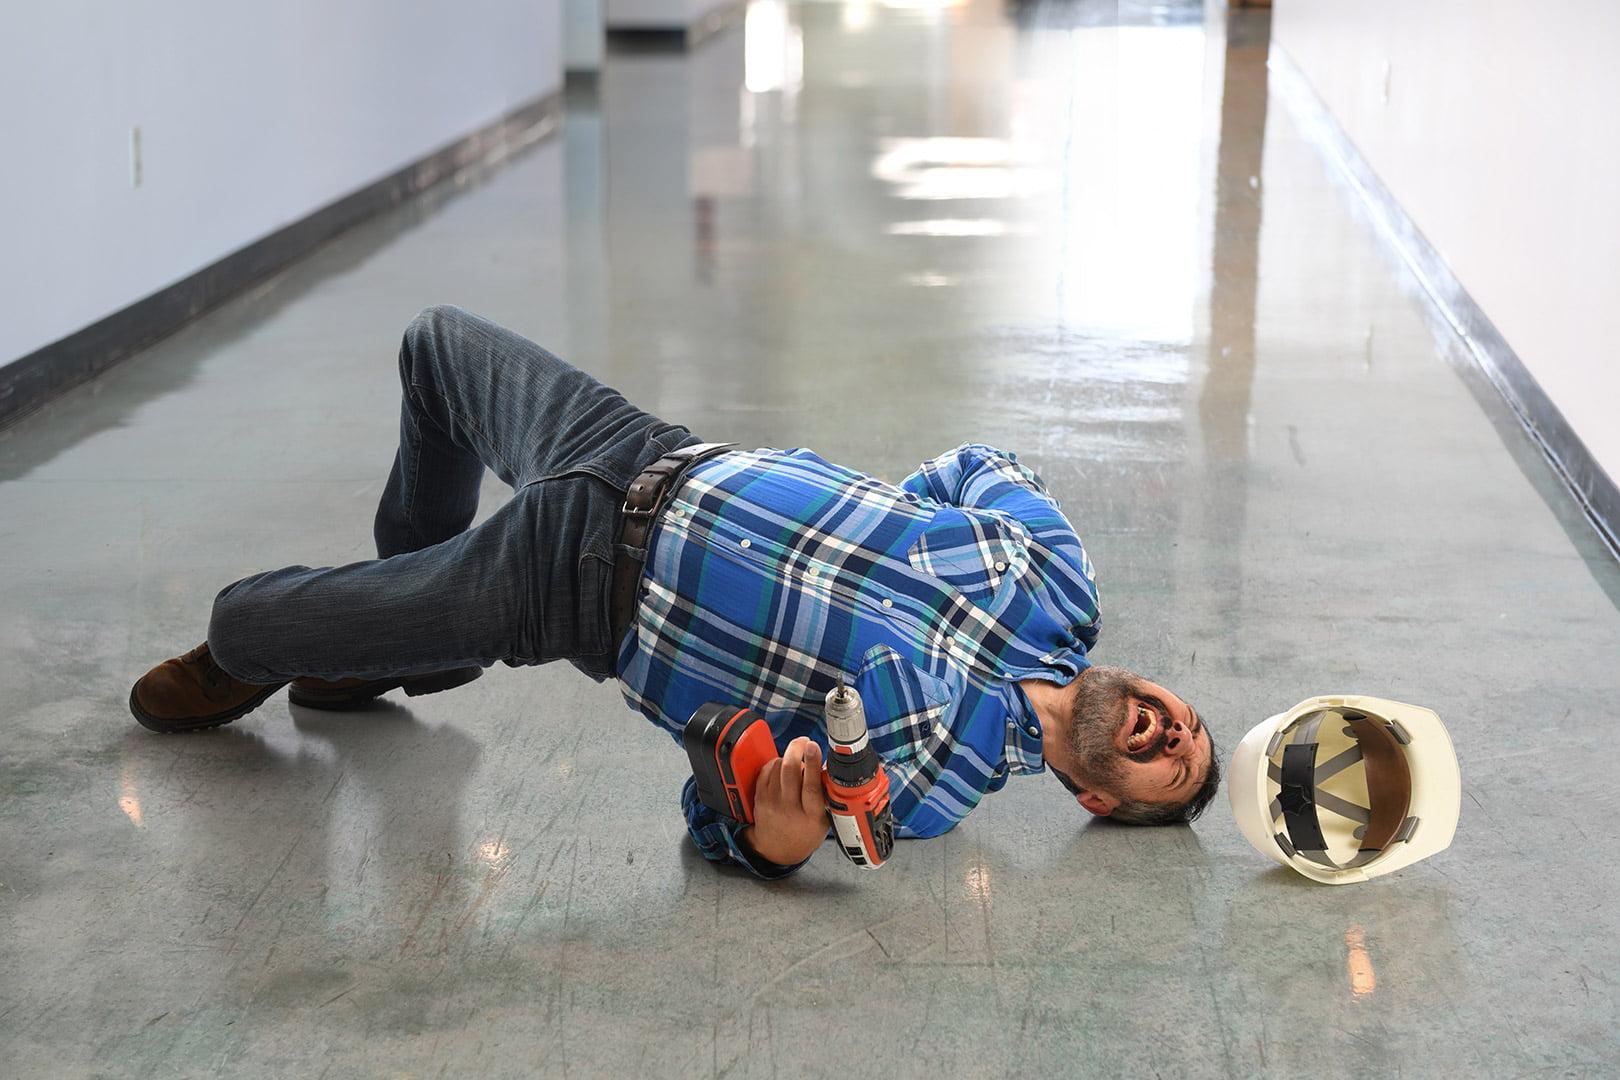 man falling on floor